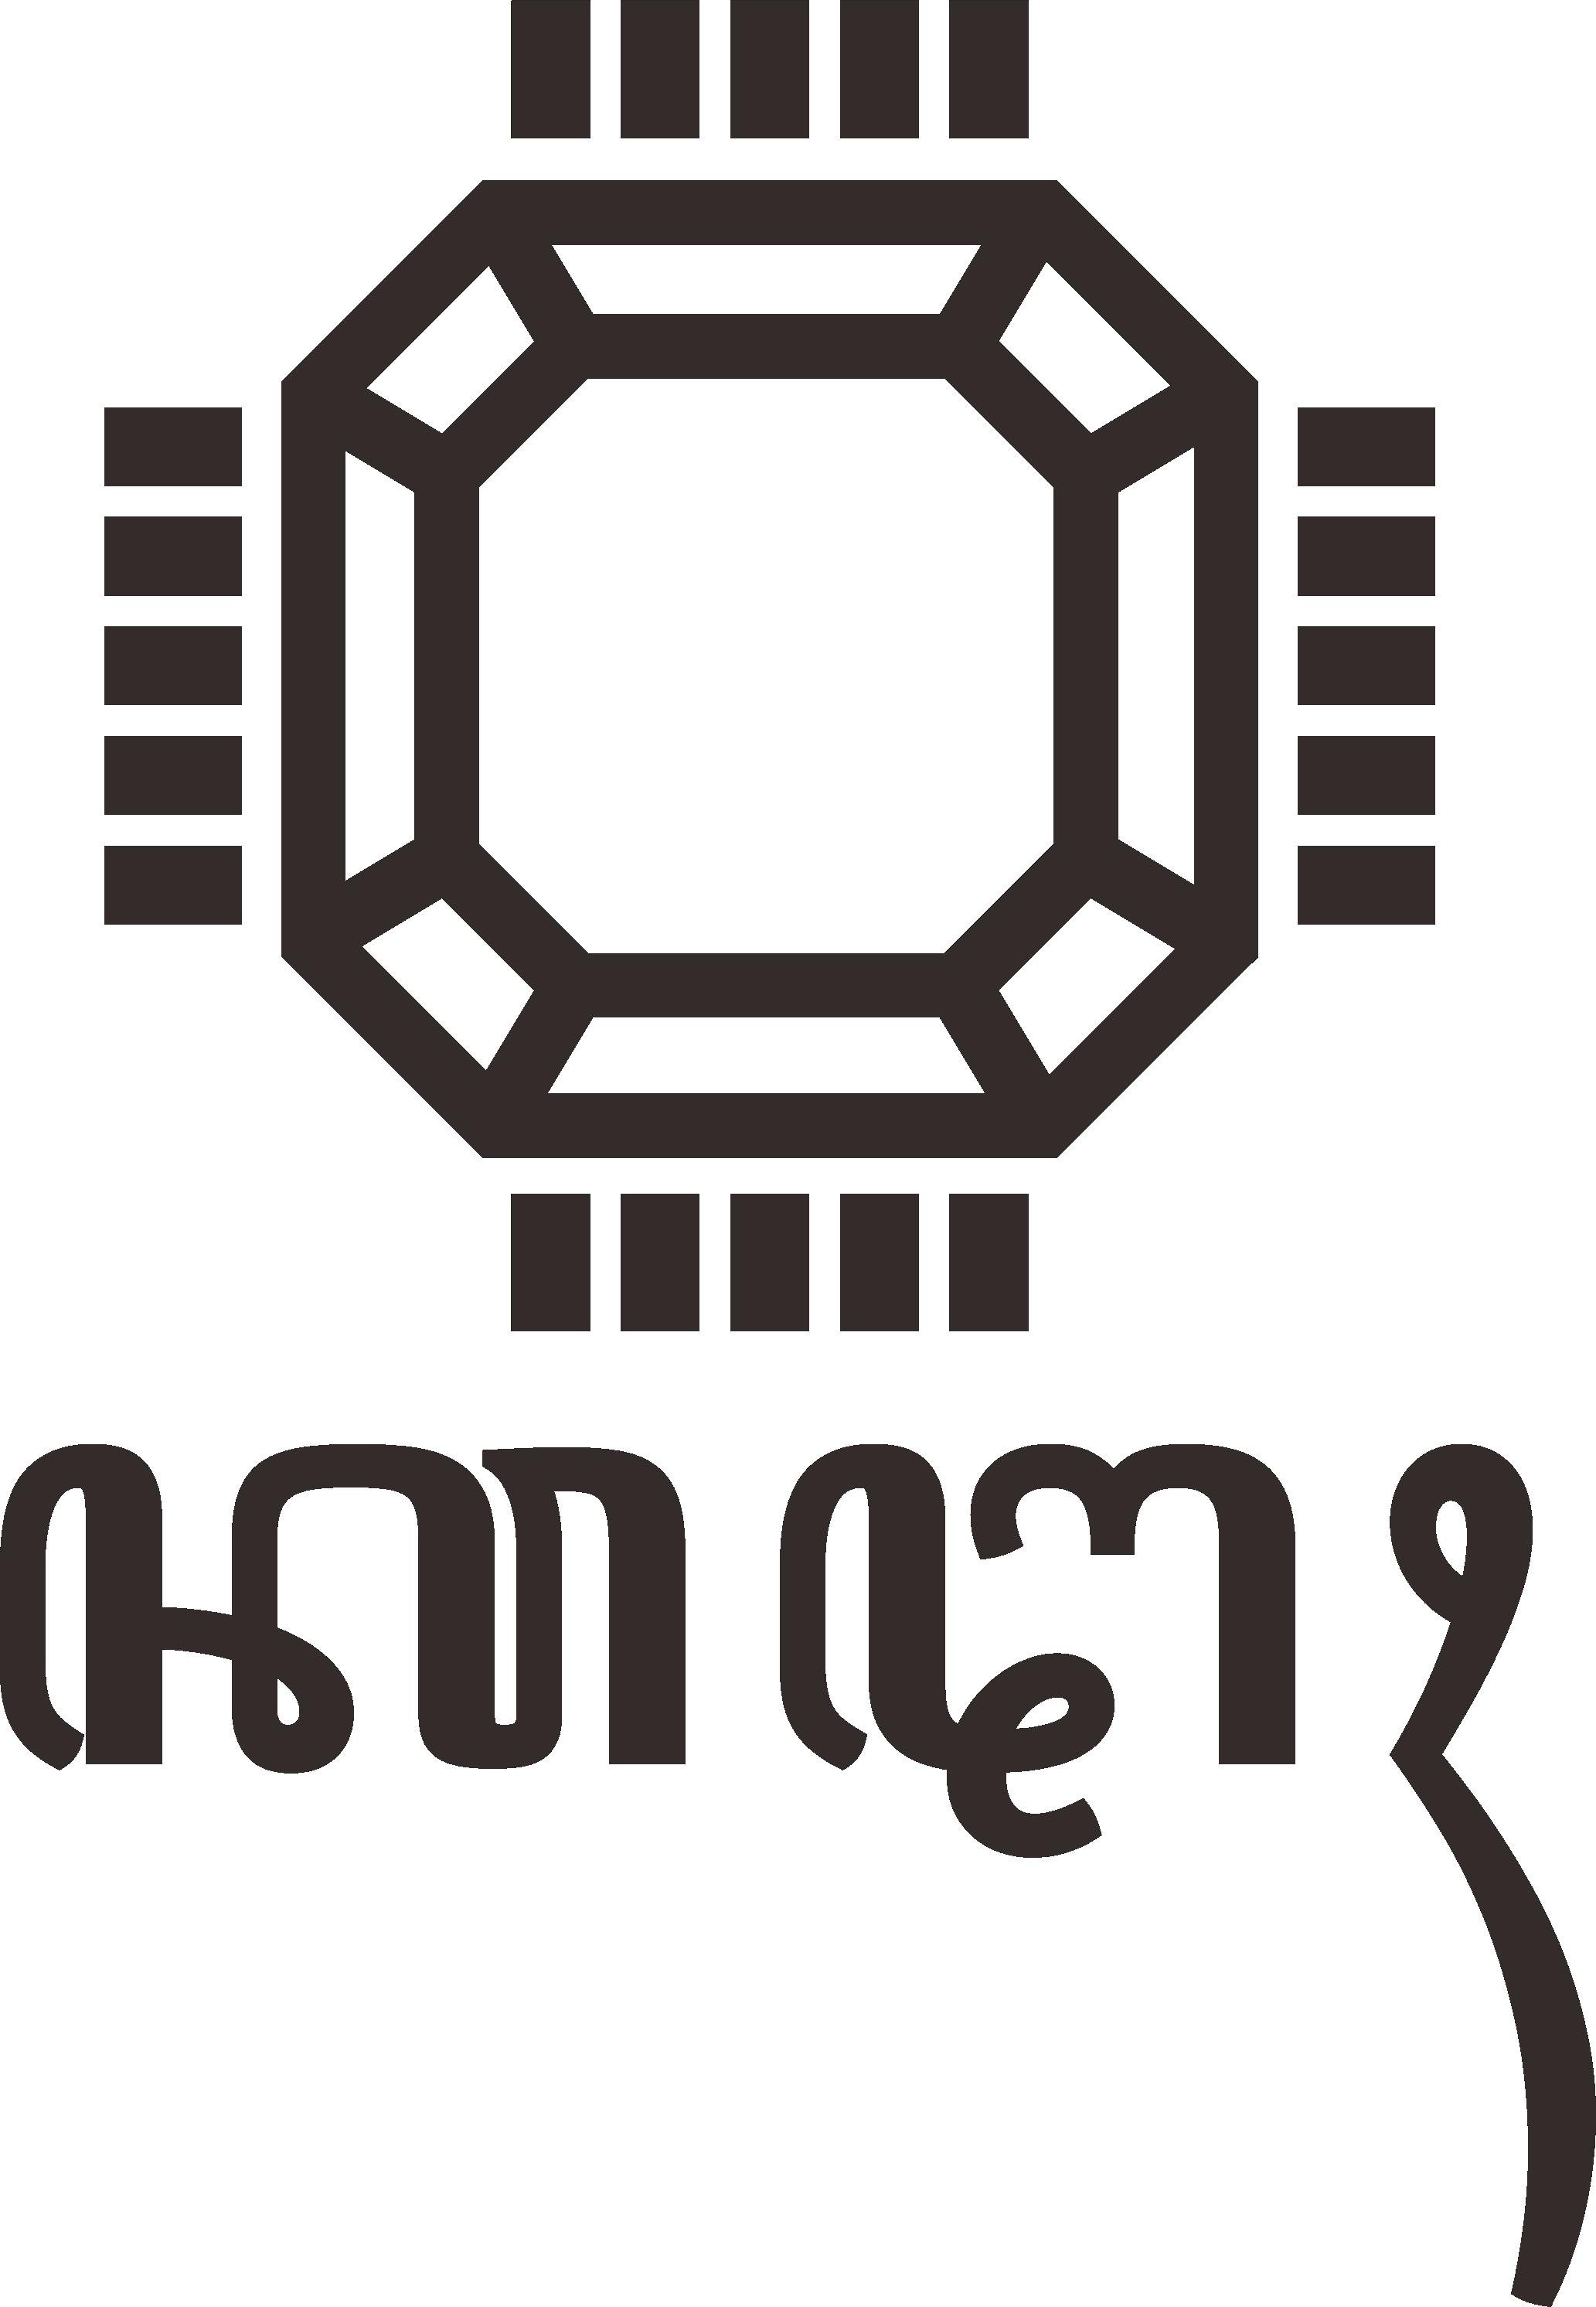 kathah